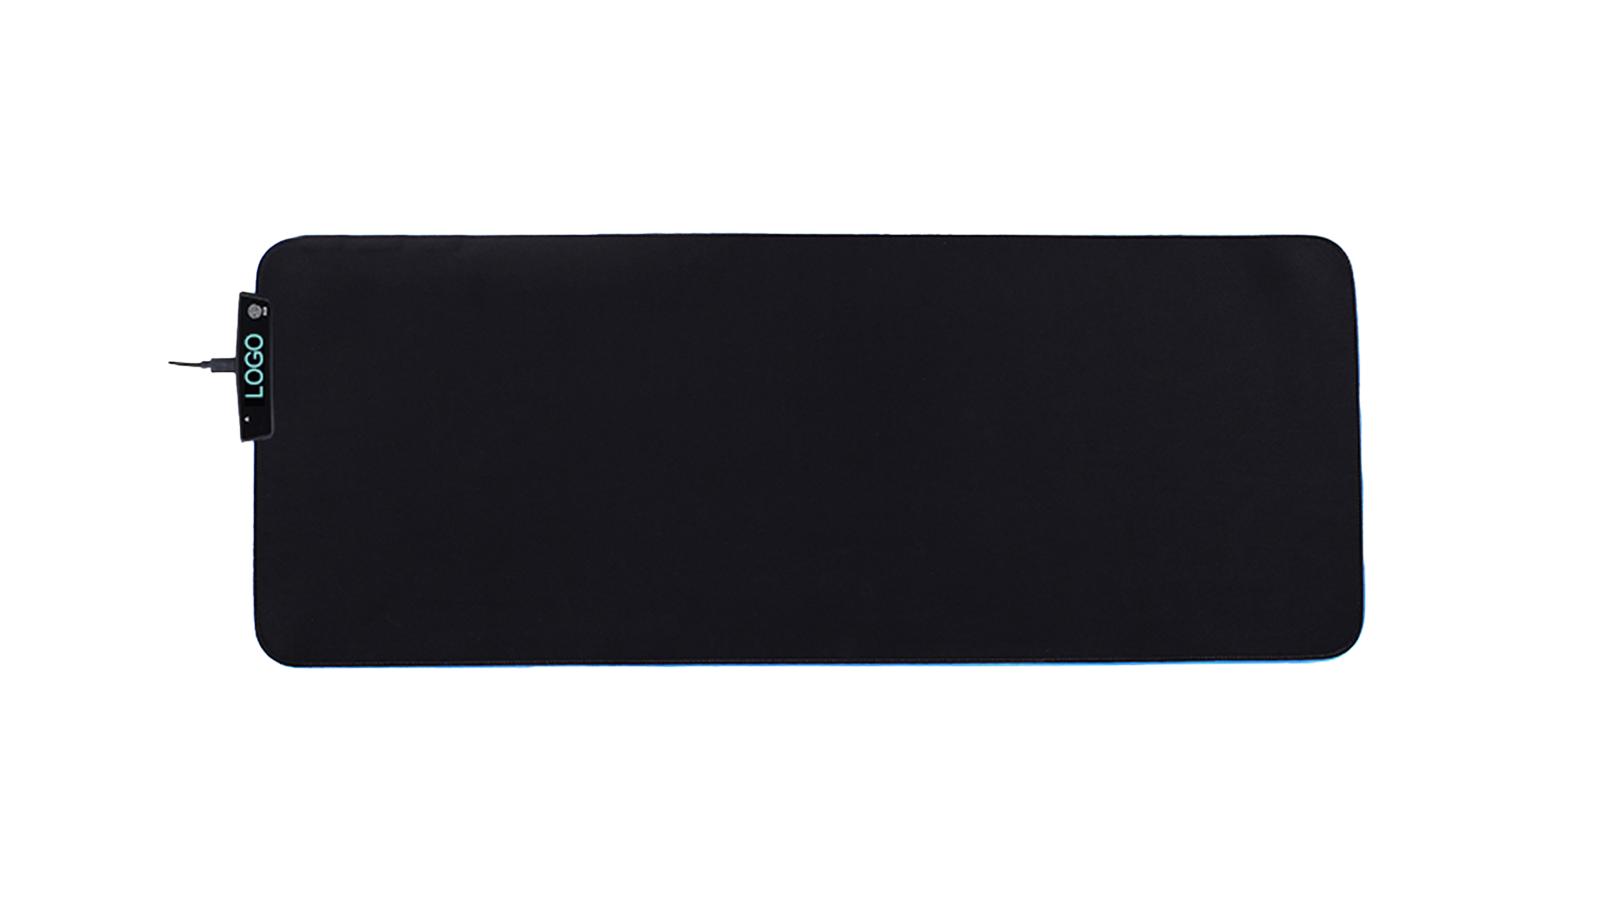 China Ky-P043 RGB Soft Mouse Pad Vervaardigers - Keyco